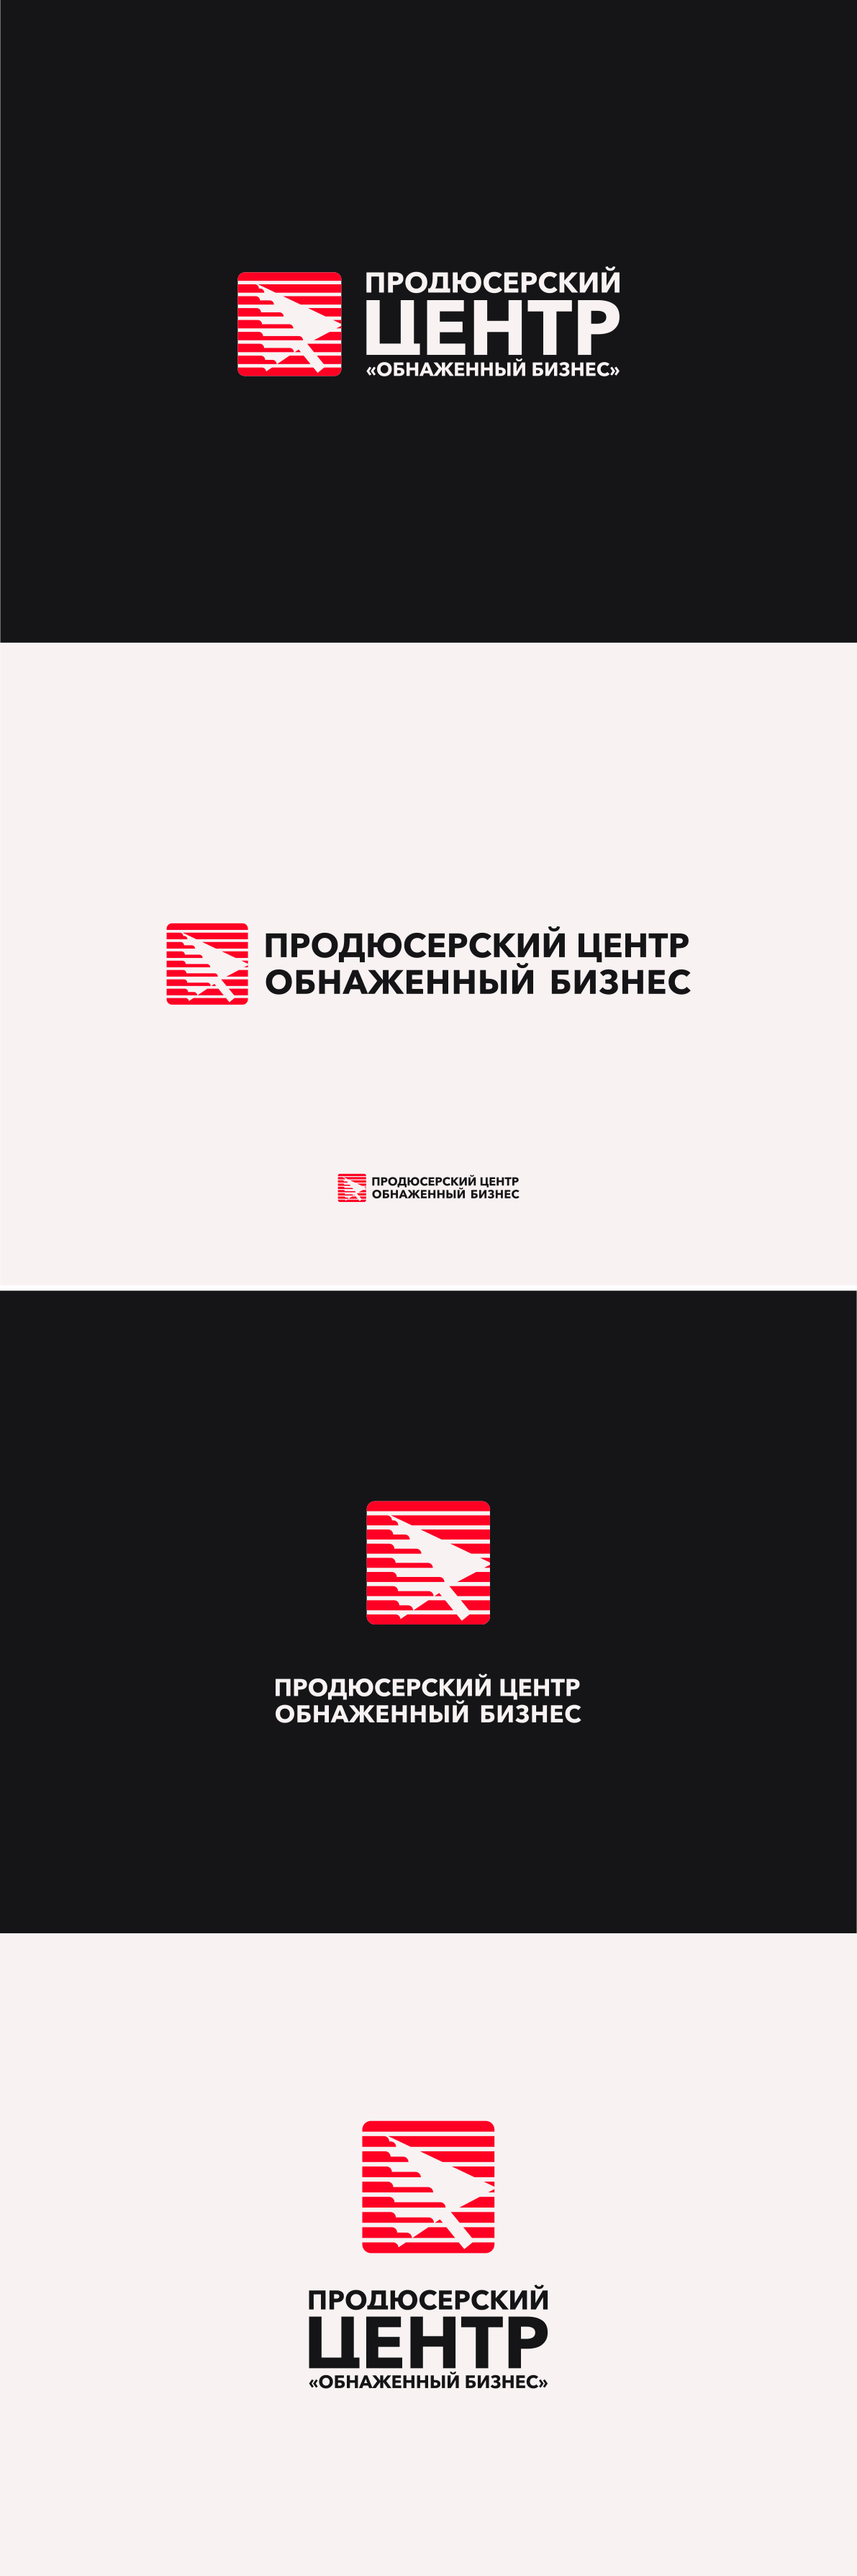 "Логотип для продюсерского центра ""Обнажённый бизнес"" фото f_4375b9d6a4e74180.png"